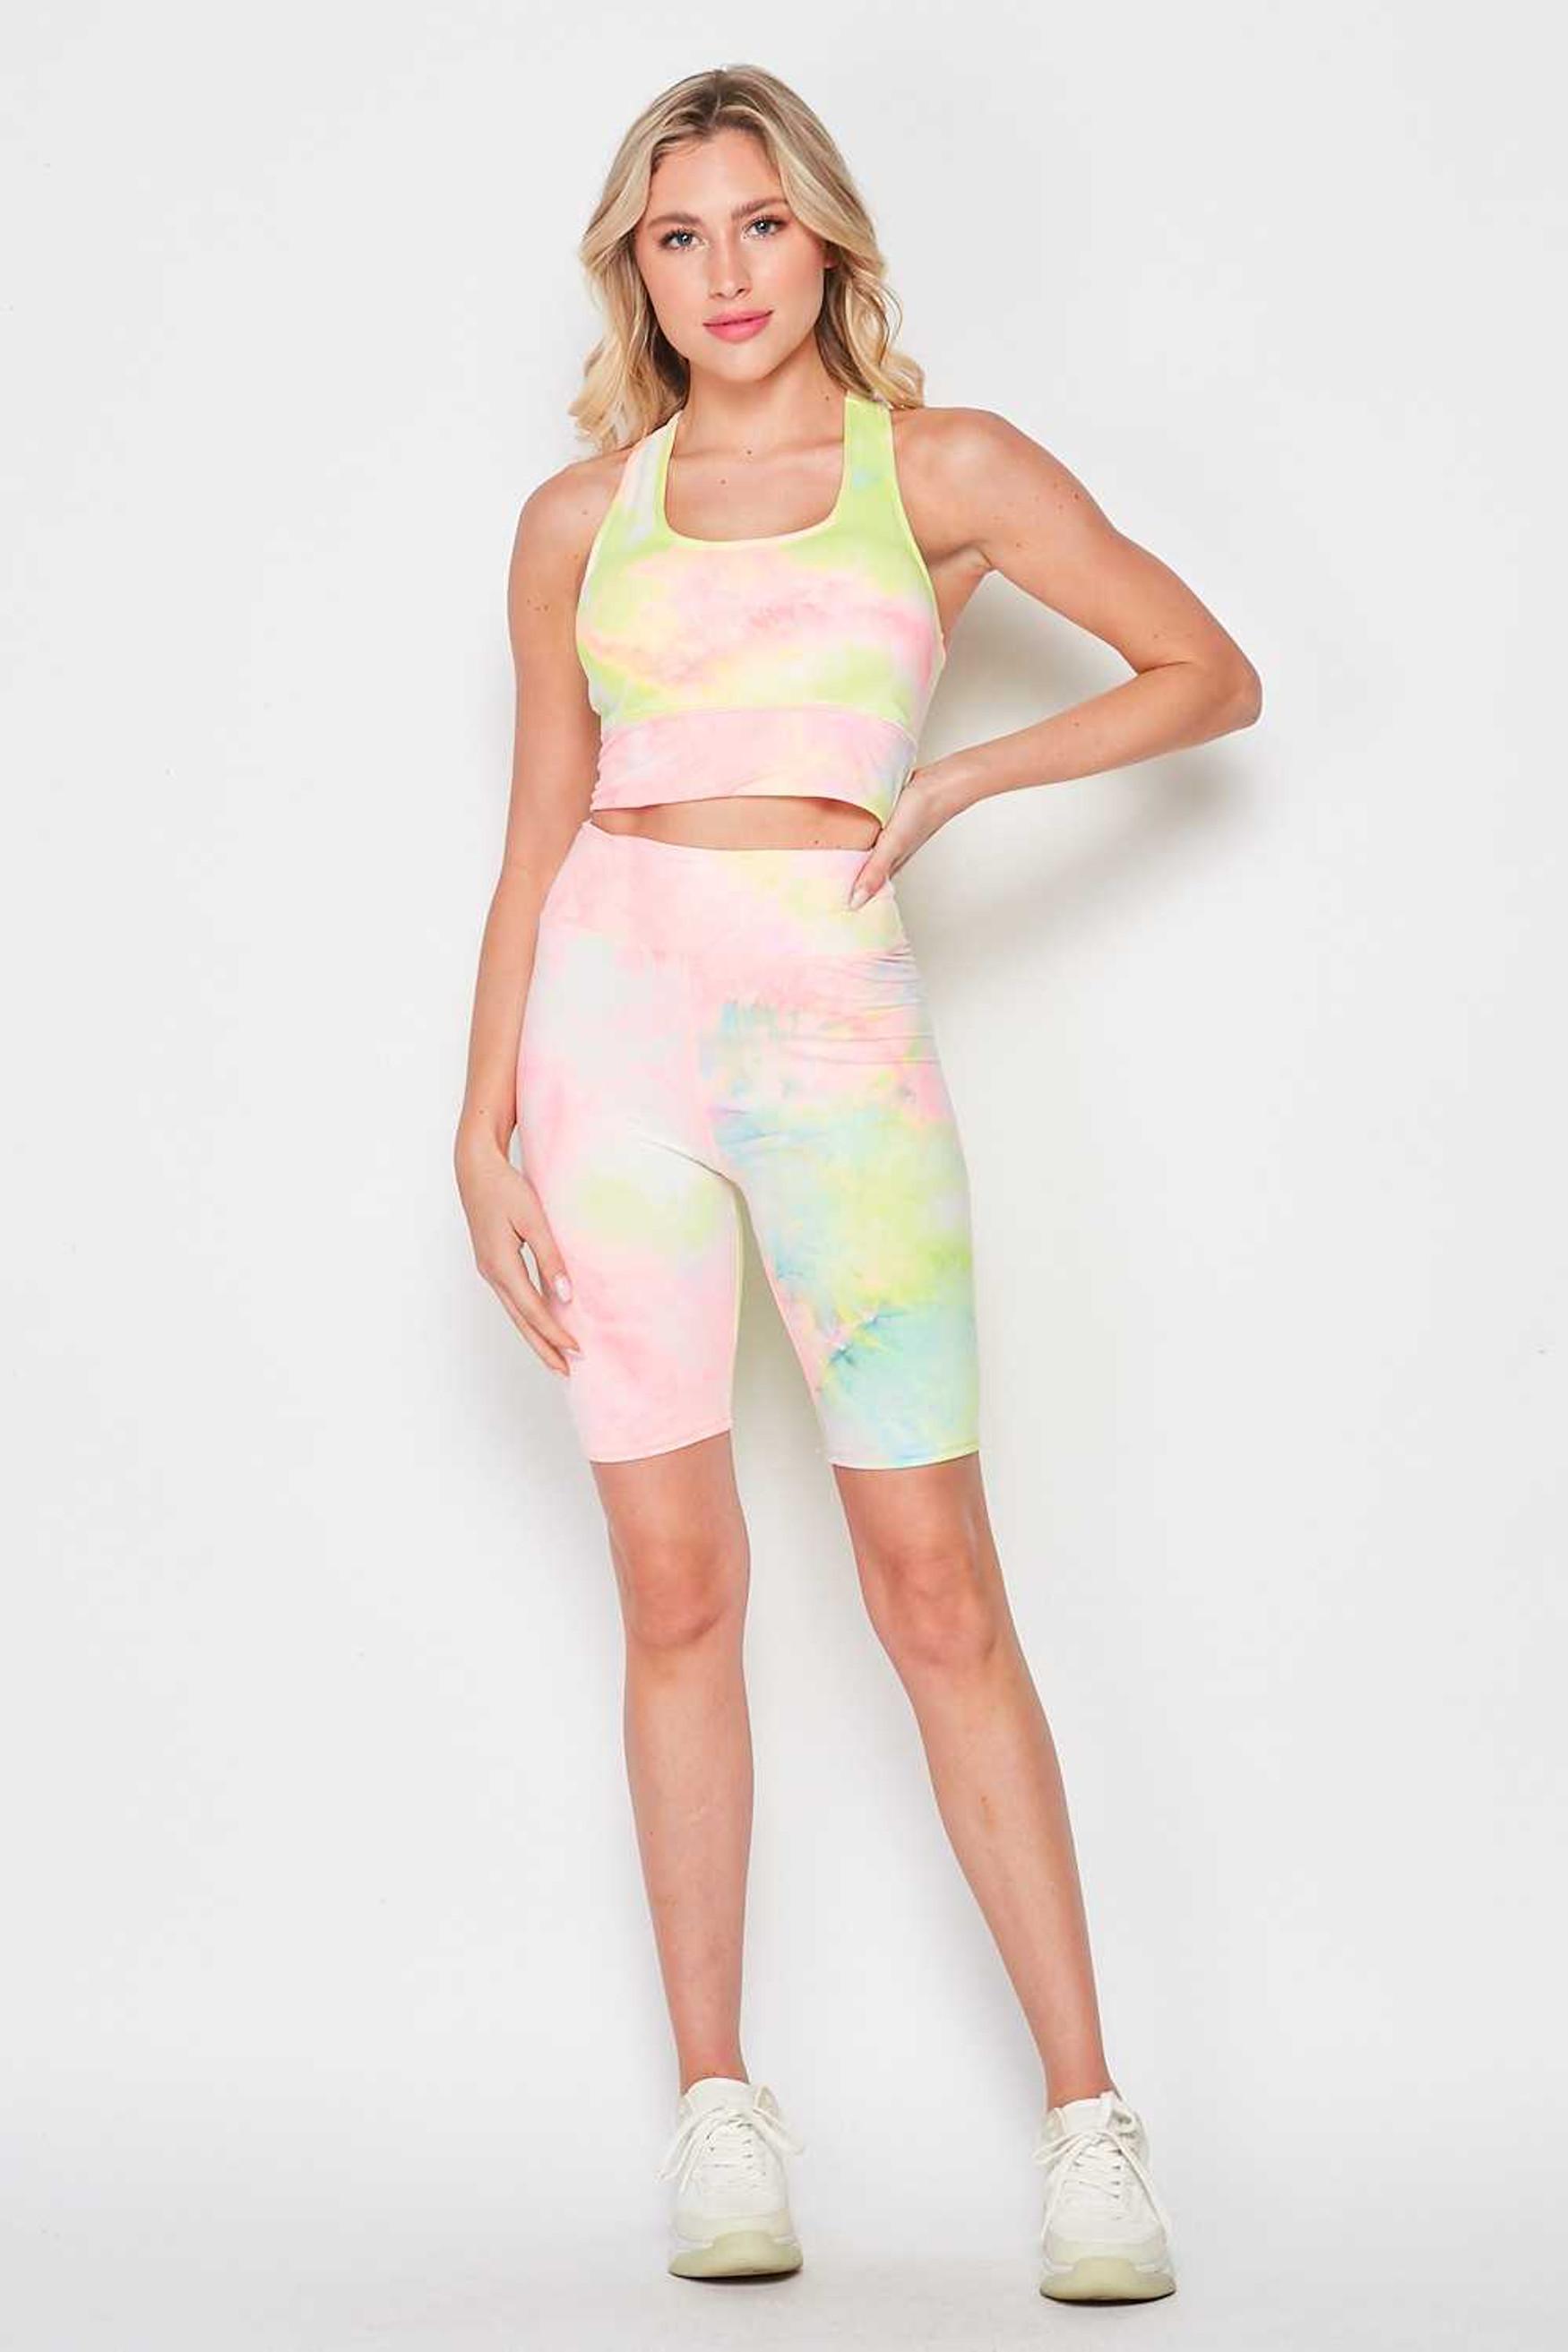 Pink / Yellow Tie Dye 2 Piece High Waisted Biker Shorts and Crop Top Set